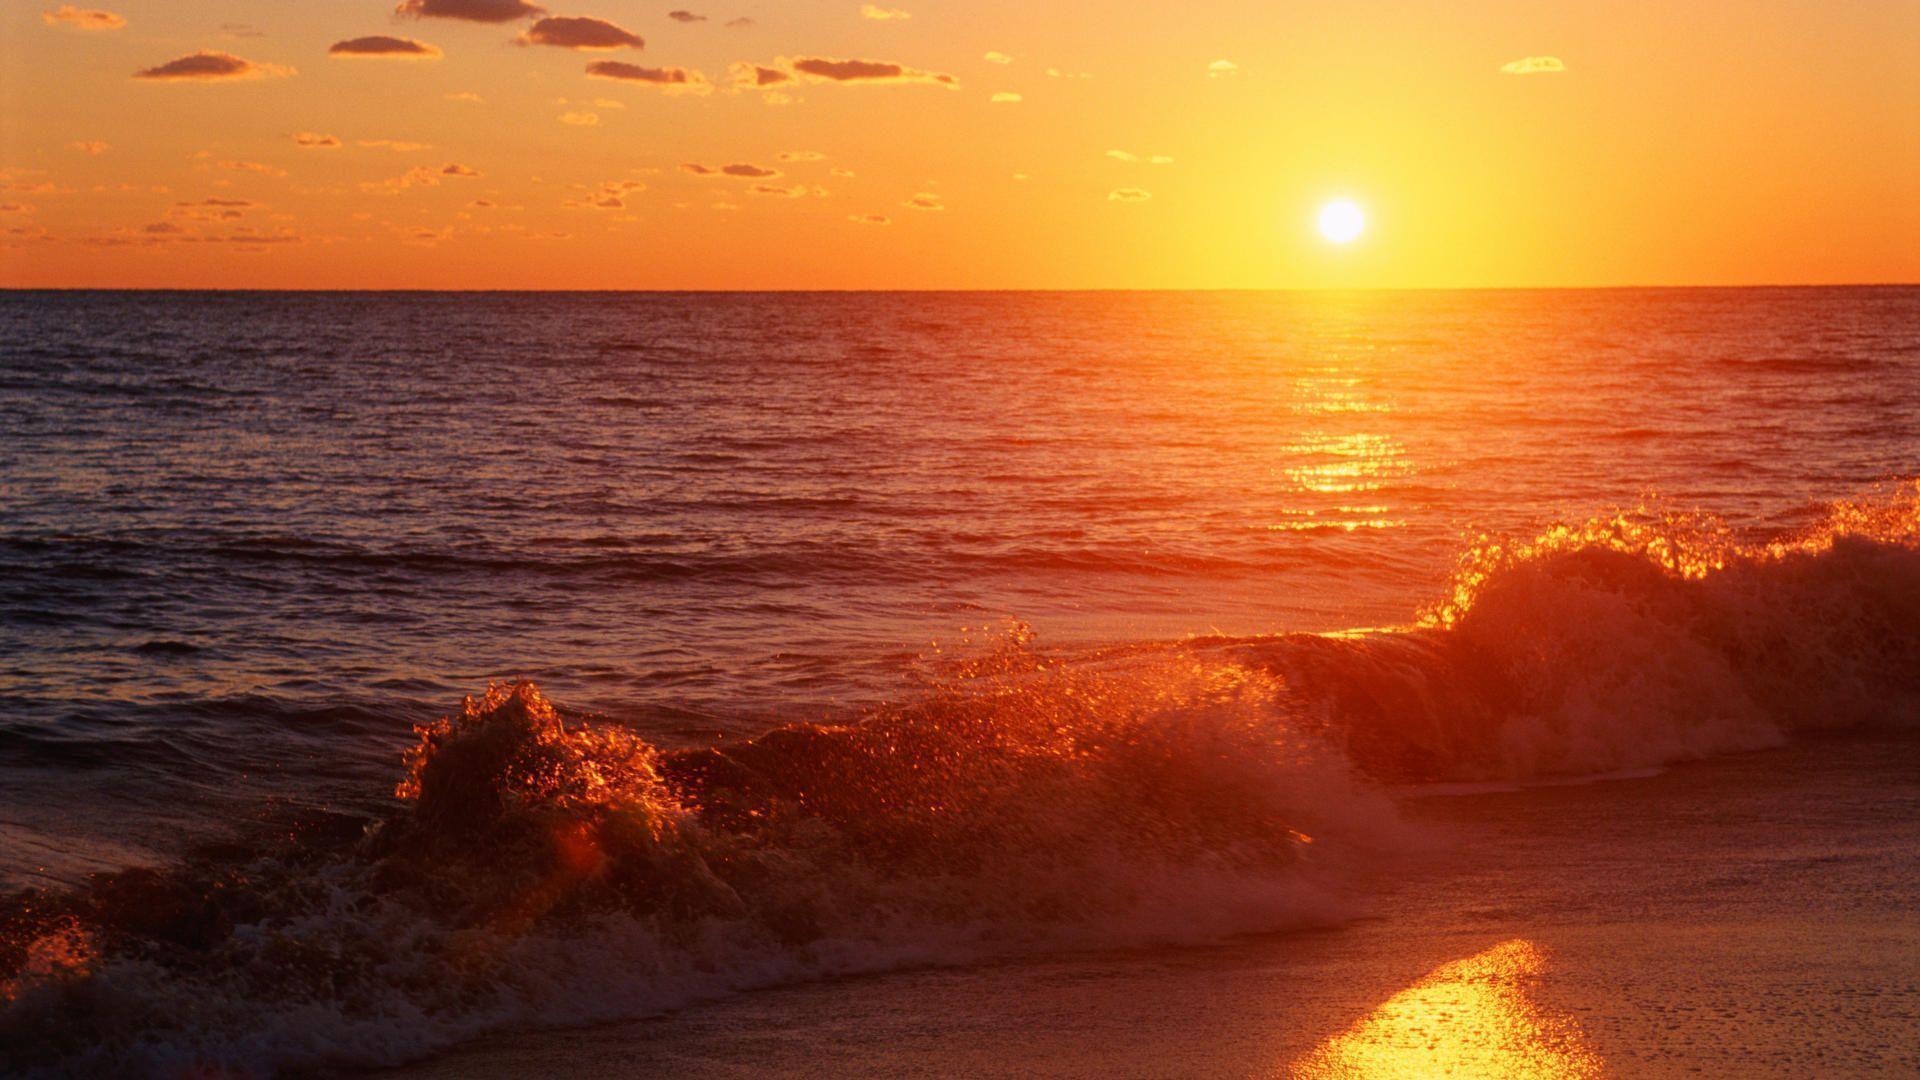 sunset beach san - photo #43